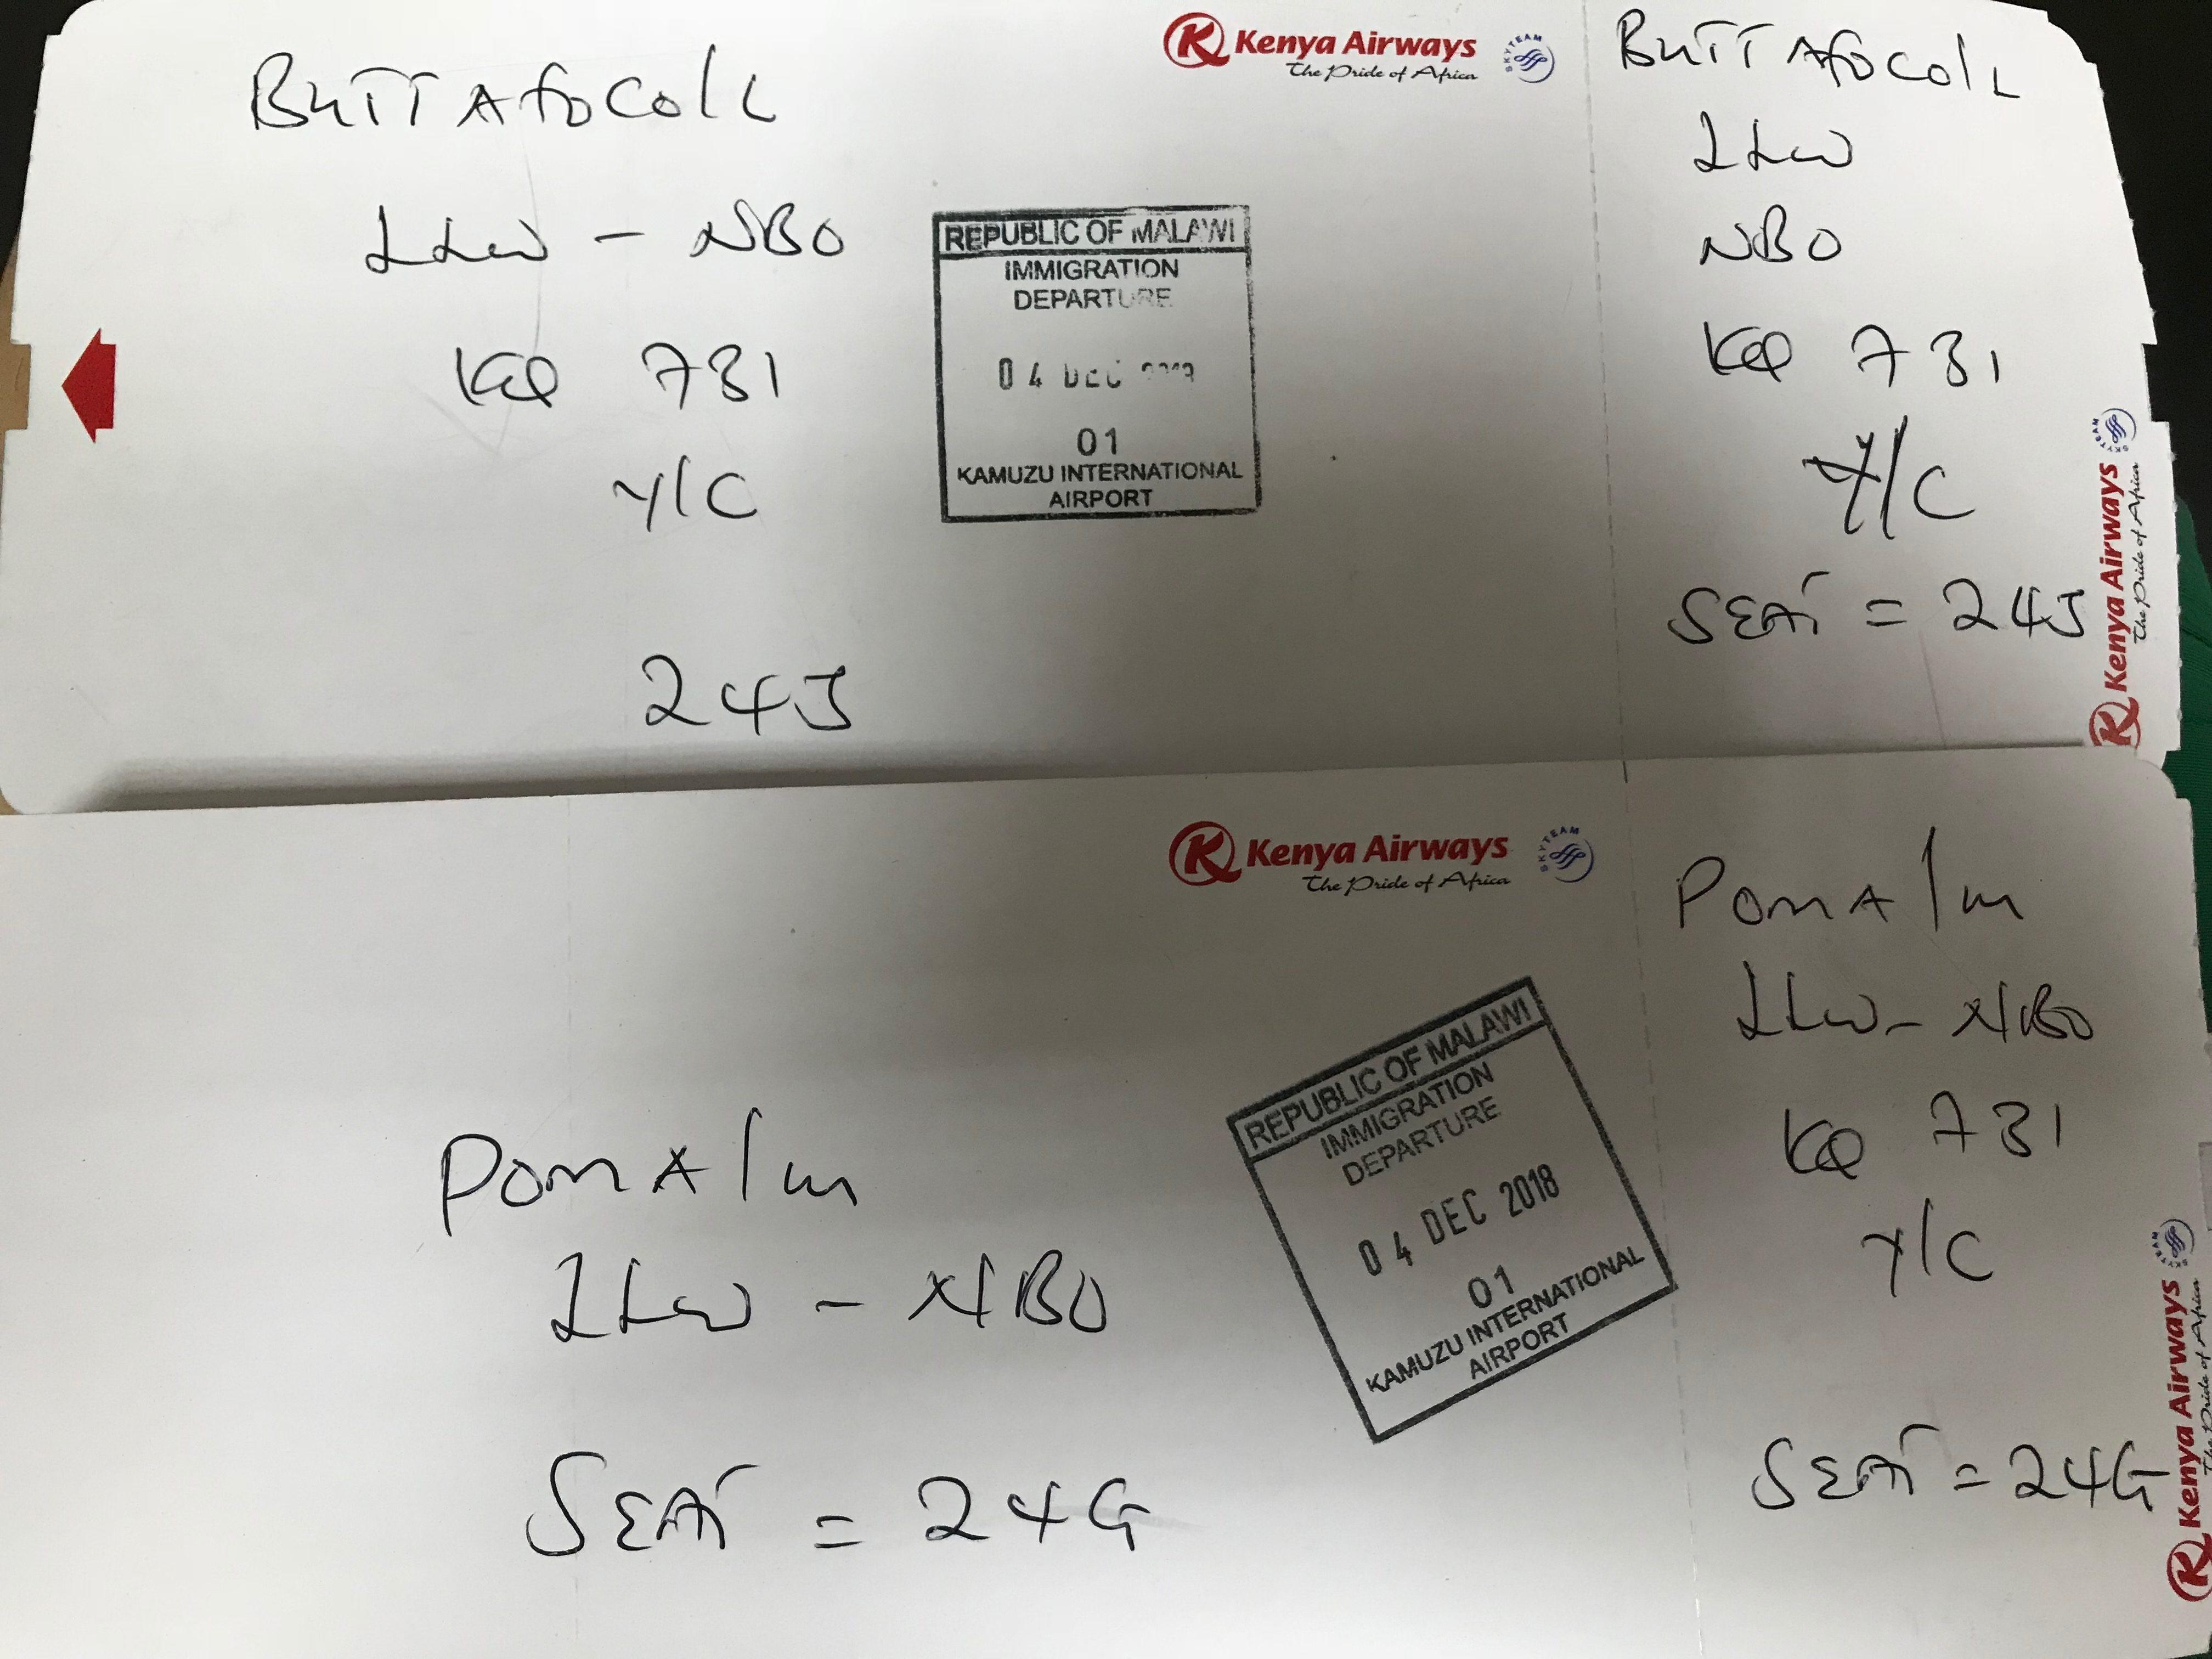 Handwritten boarding passes